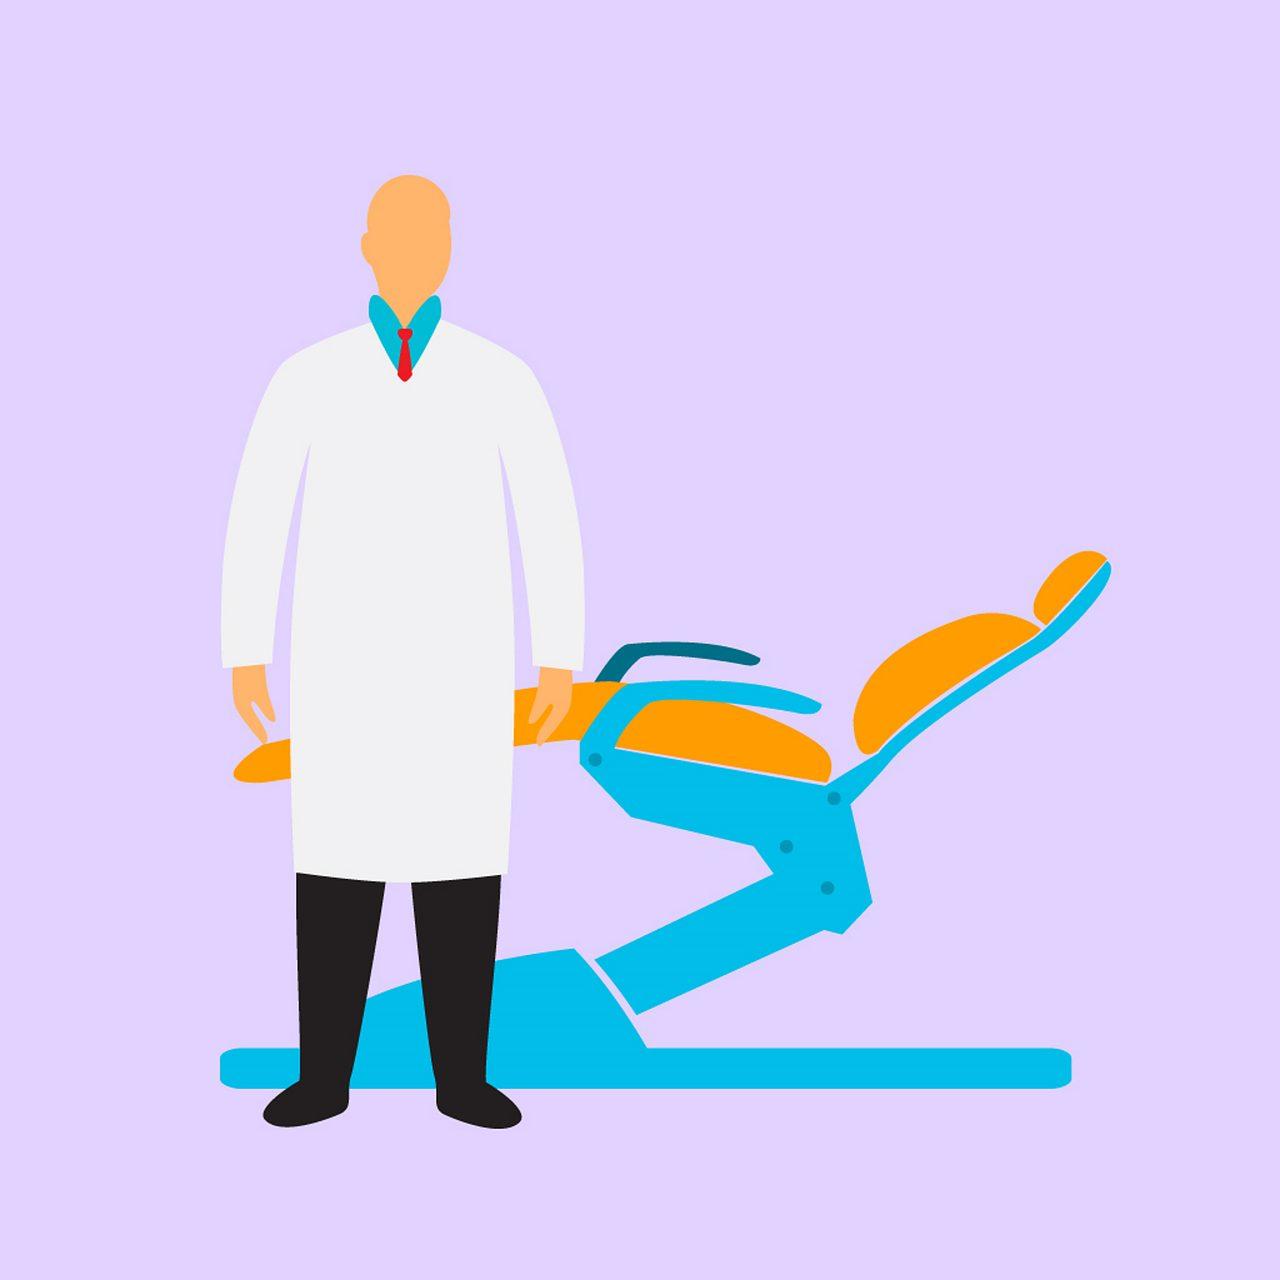 Bock tandarts F spoed tandarts